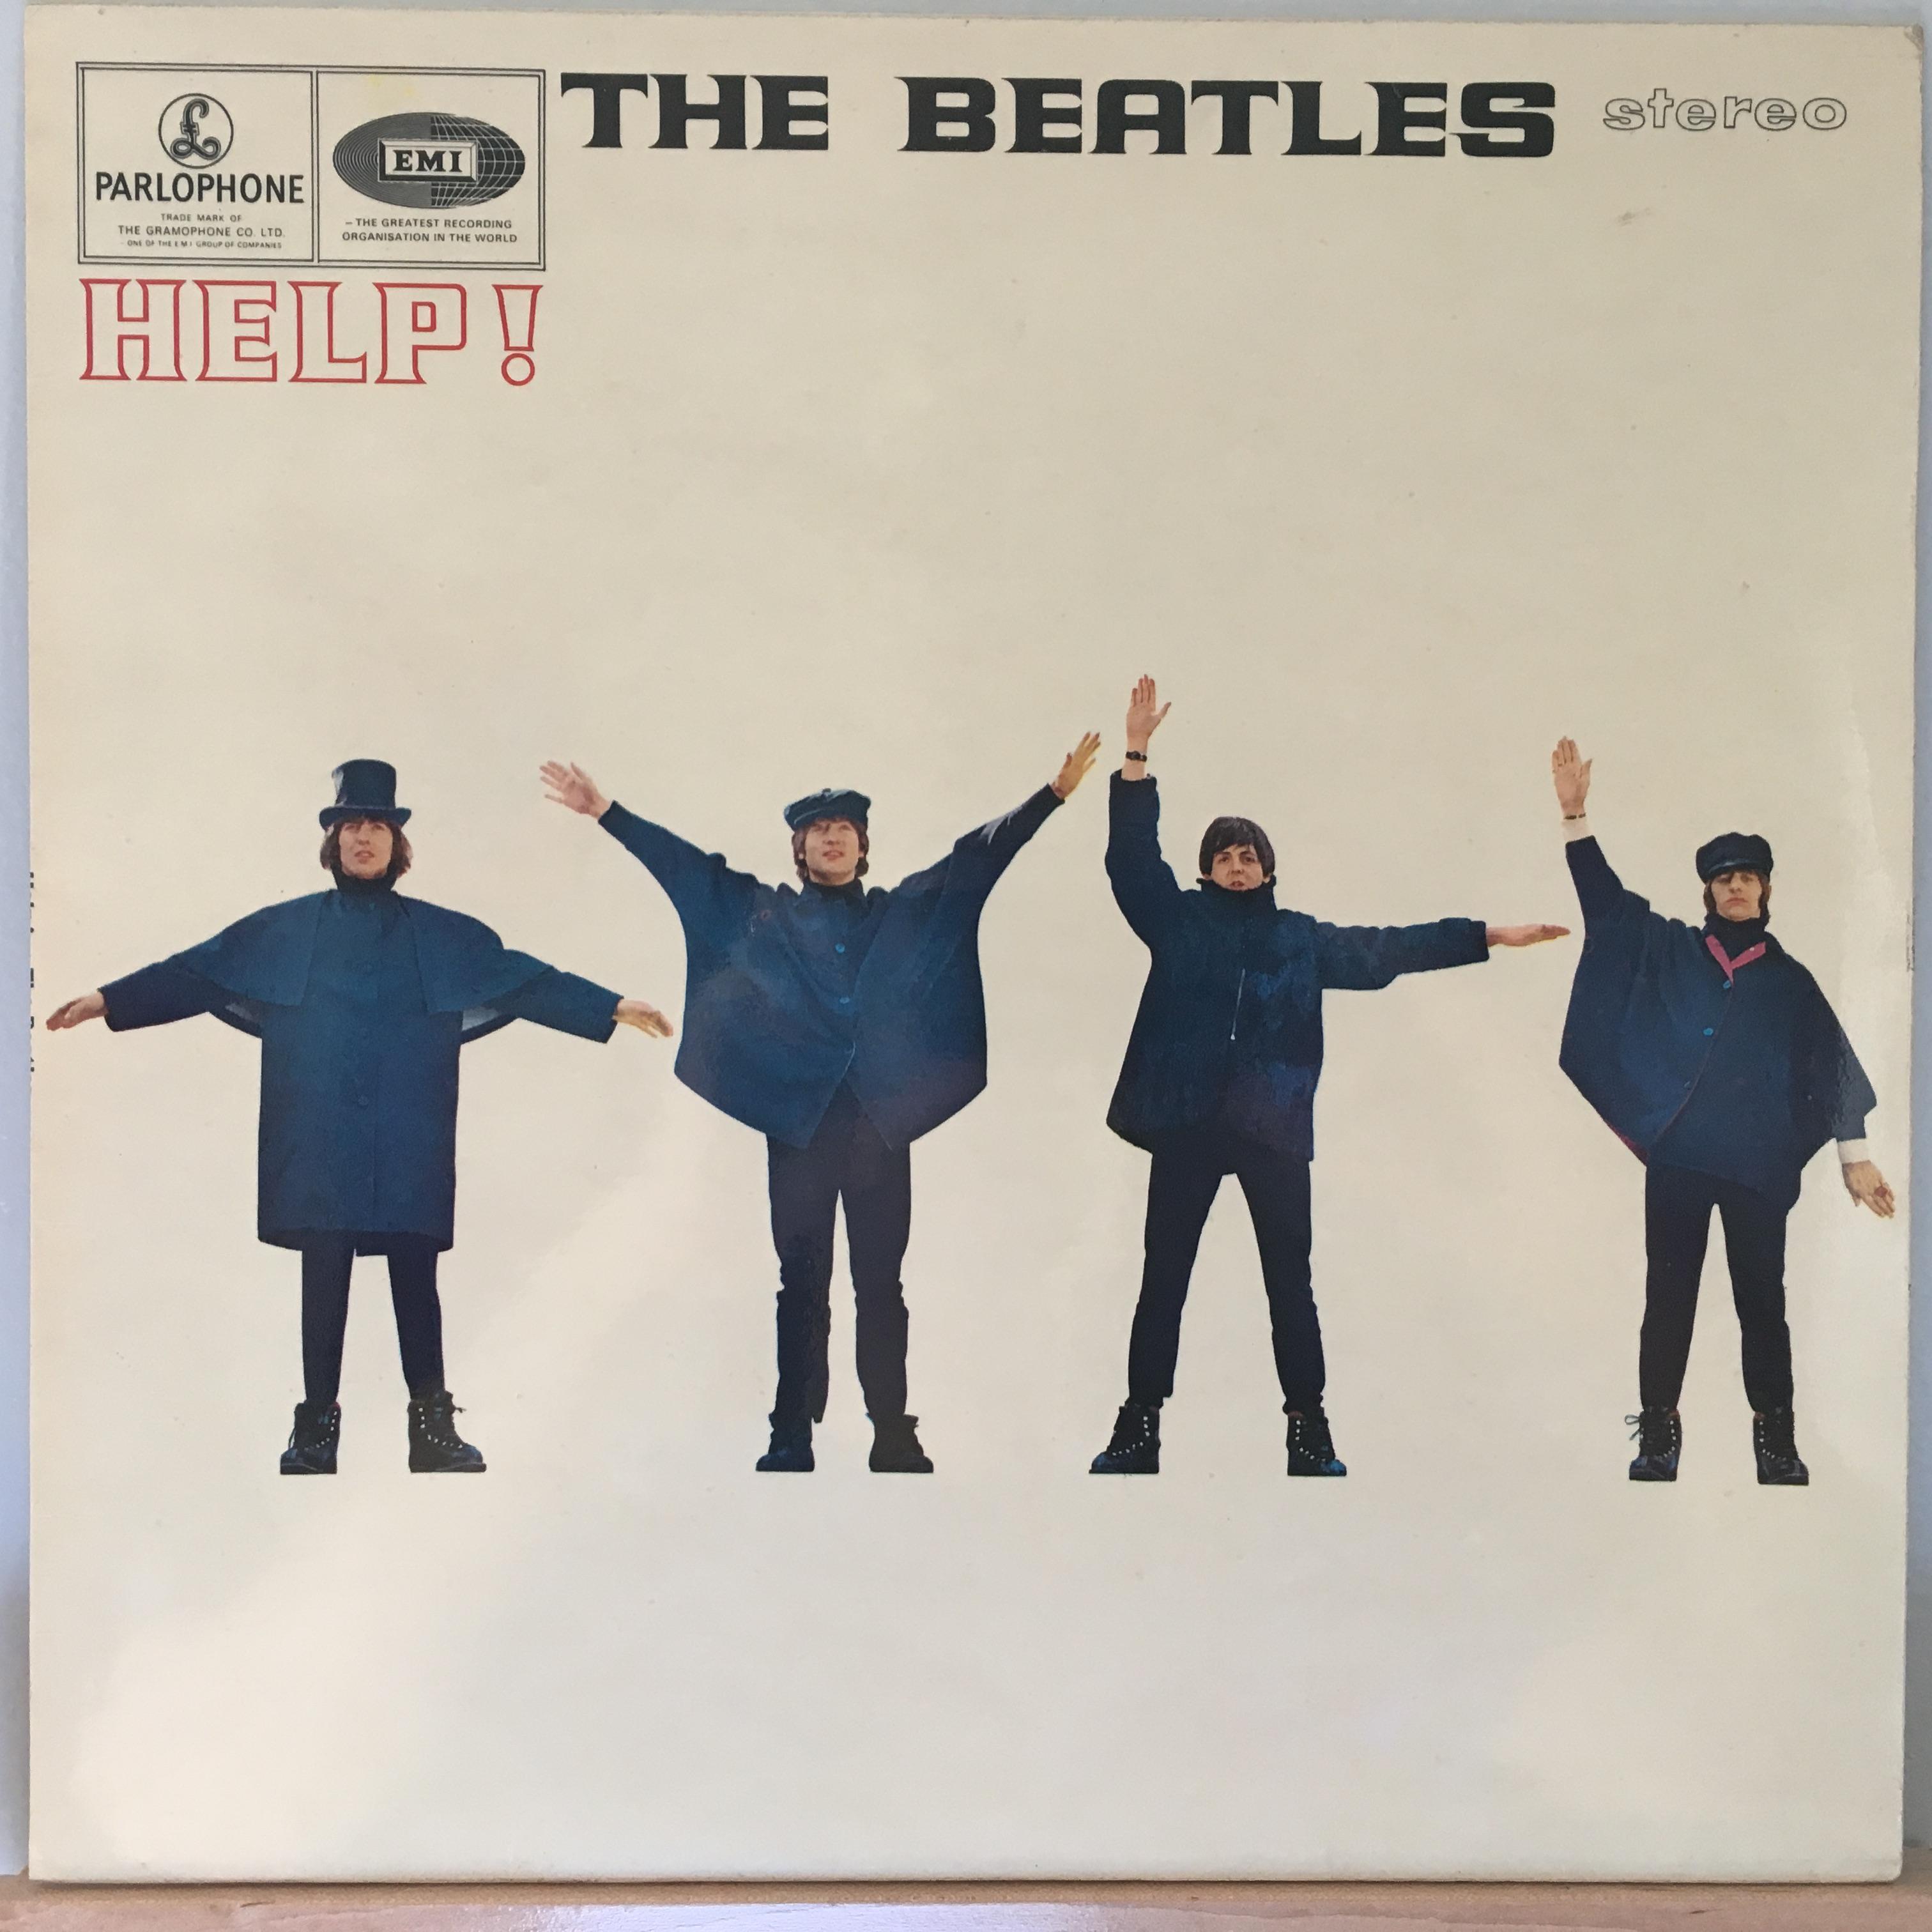 Help! front cover – good at rock music, bad at semaphore